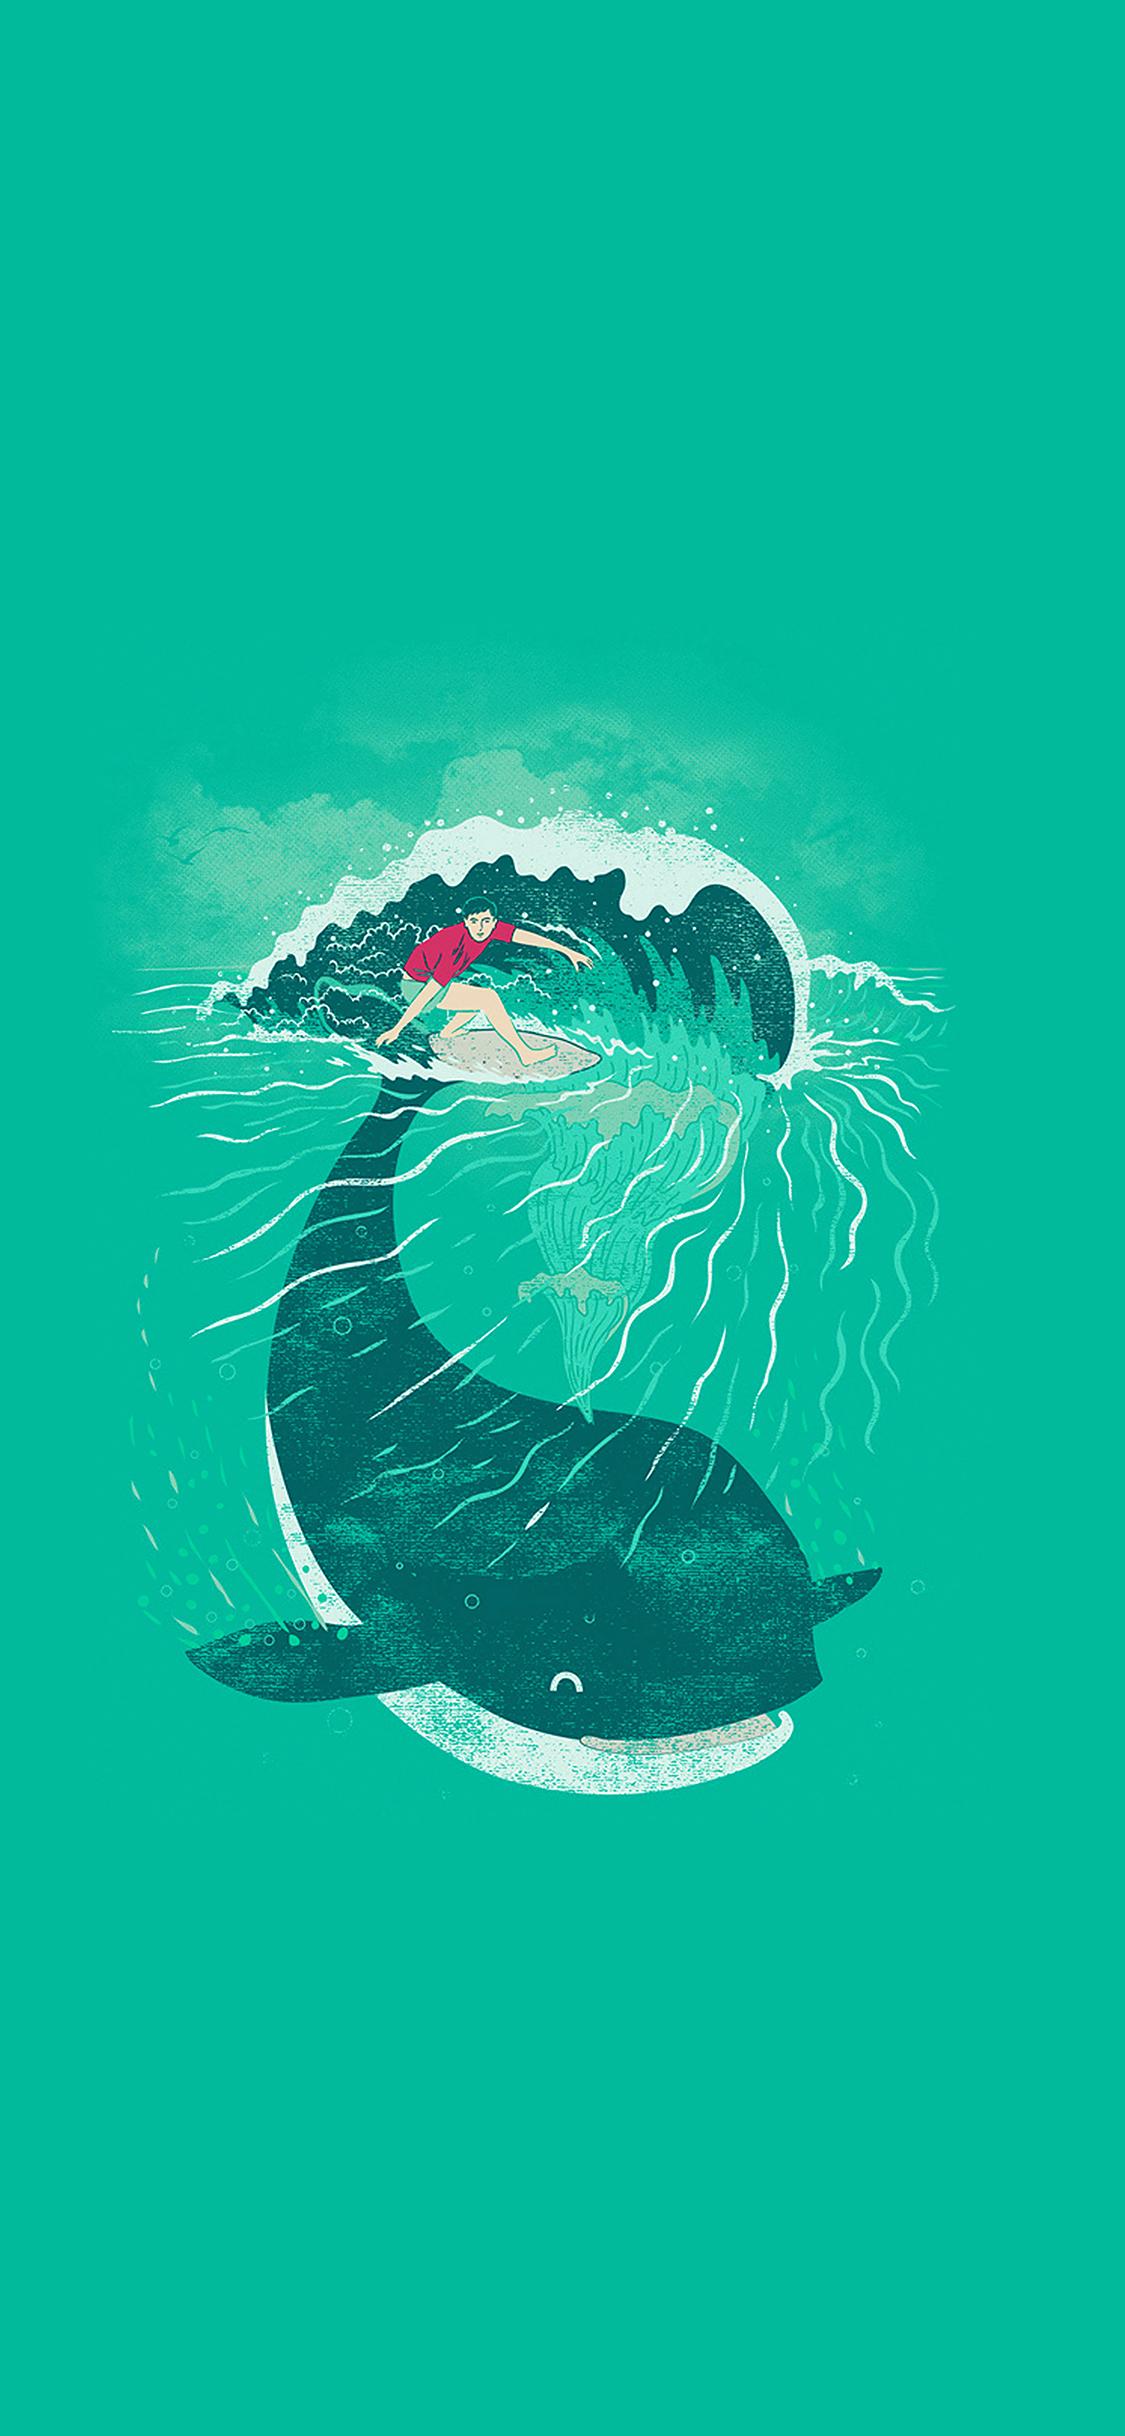 Imac Girl Wallpaper Ah85 Whale Surfer Wave Animal Illust Art Sea Wallpaper